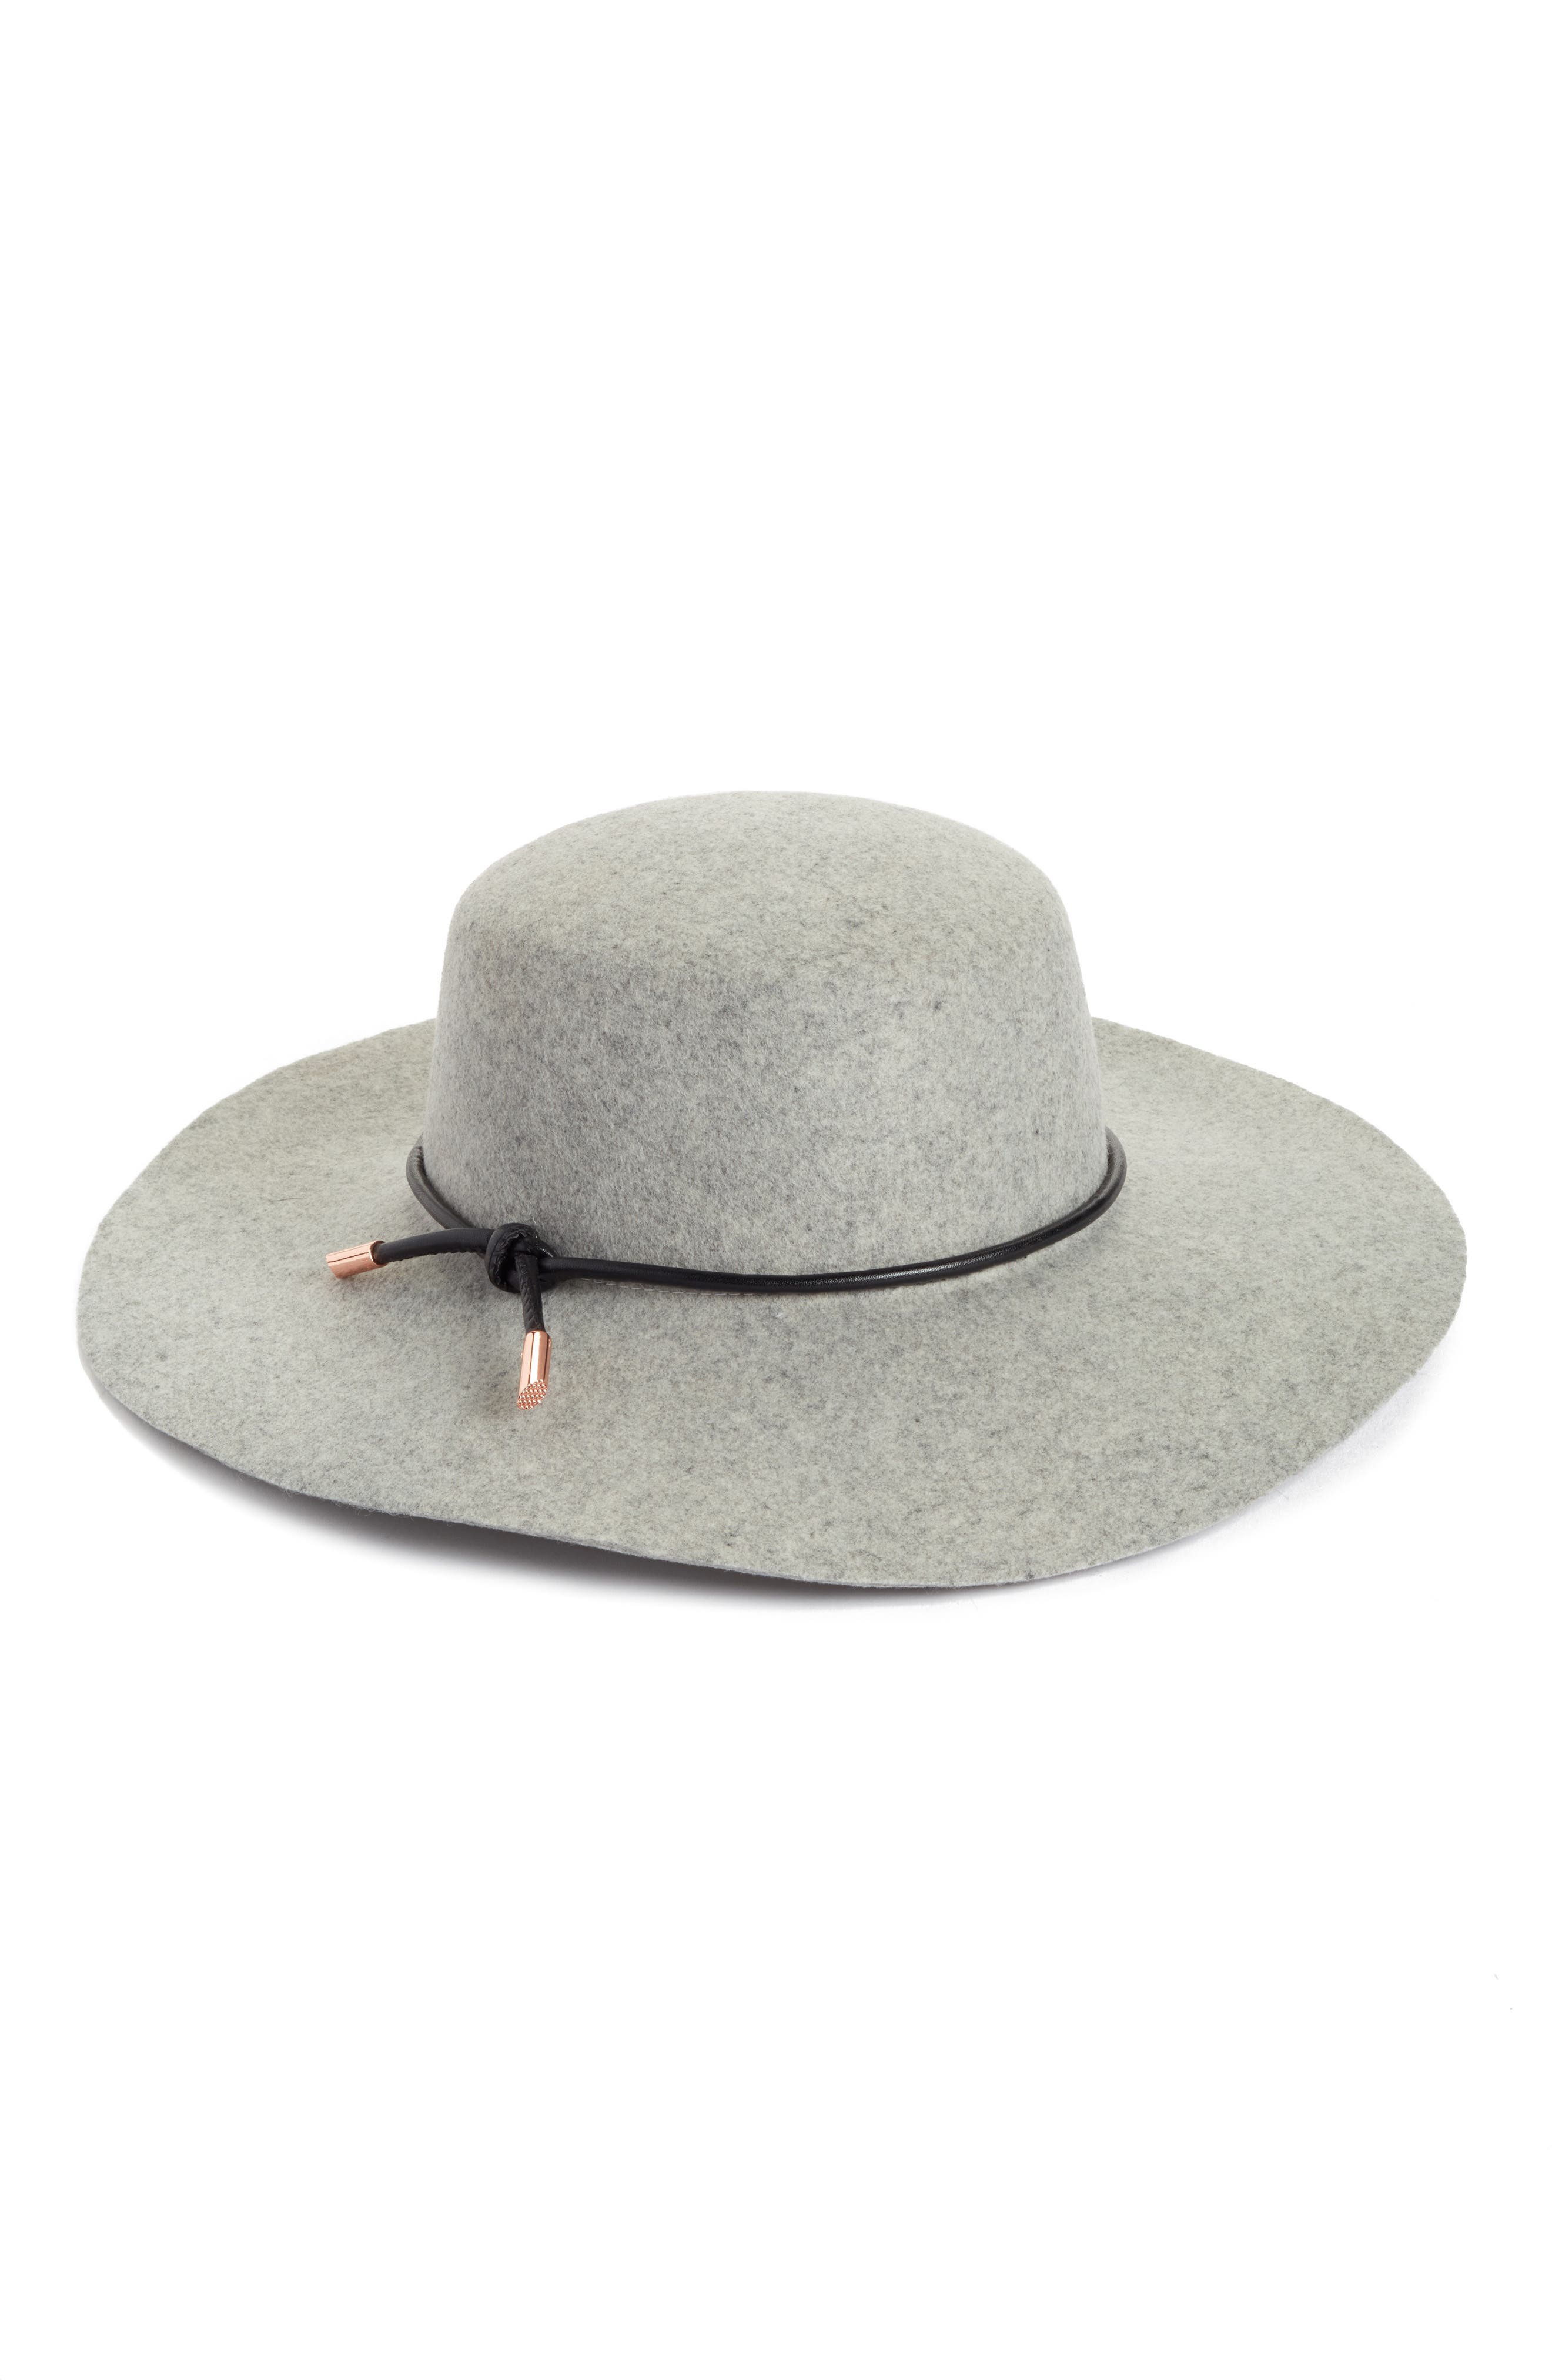 Alternate Image 1 Selected - Ted Baker London Rope Trim Wool Felt Hat